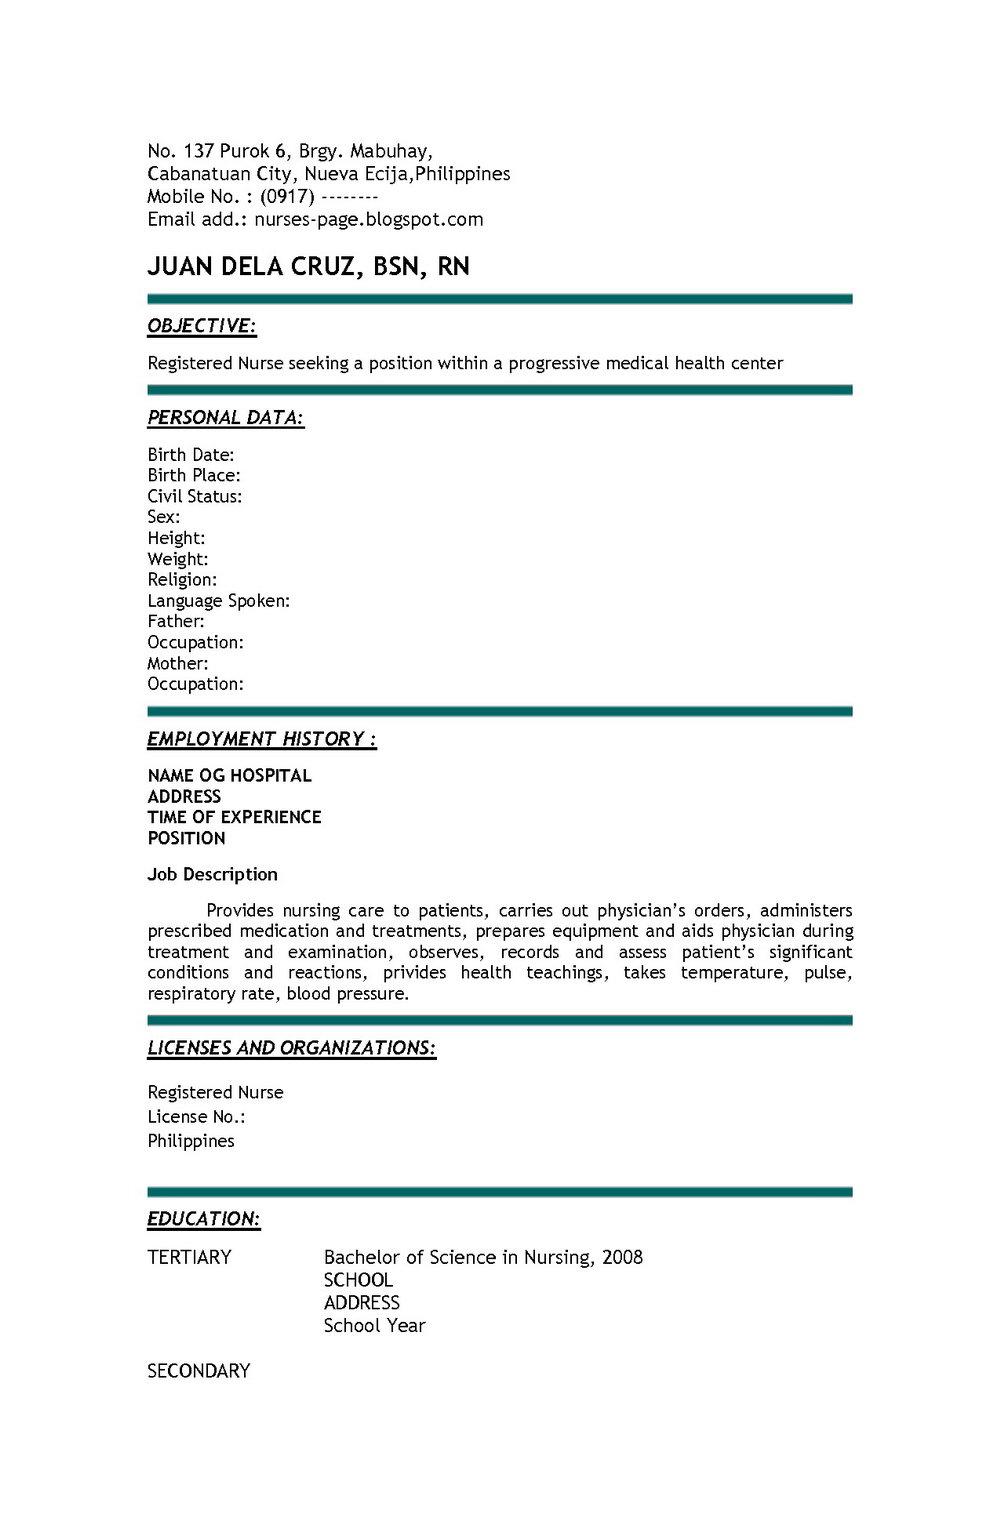 Example Resume For Registered Nurse